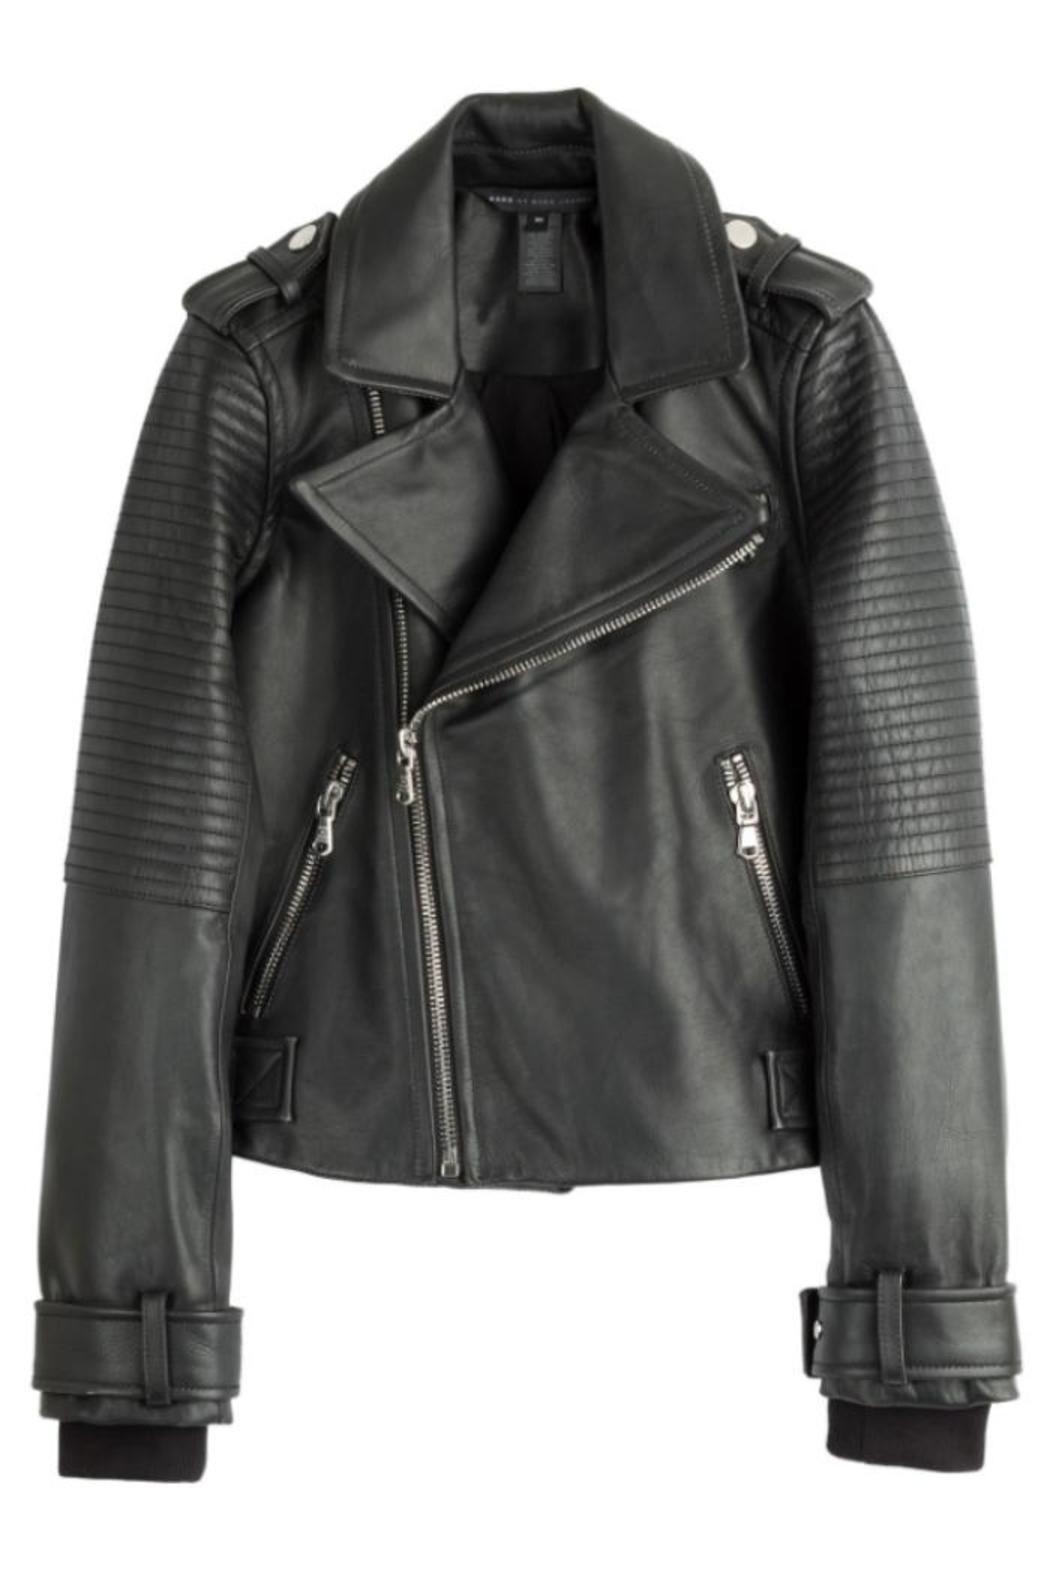 Moto Leather Jacket Marc Jacobs Leather Black Leather Biker Jacket Leather Jacket [ 1575 x 1050 Pixel ]